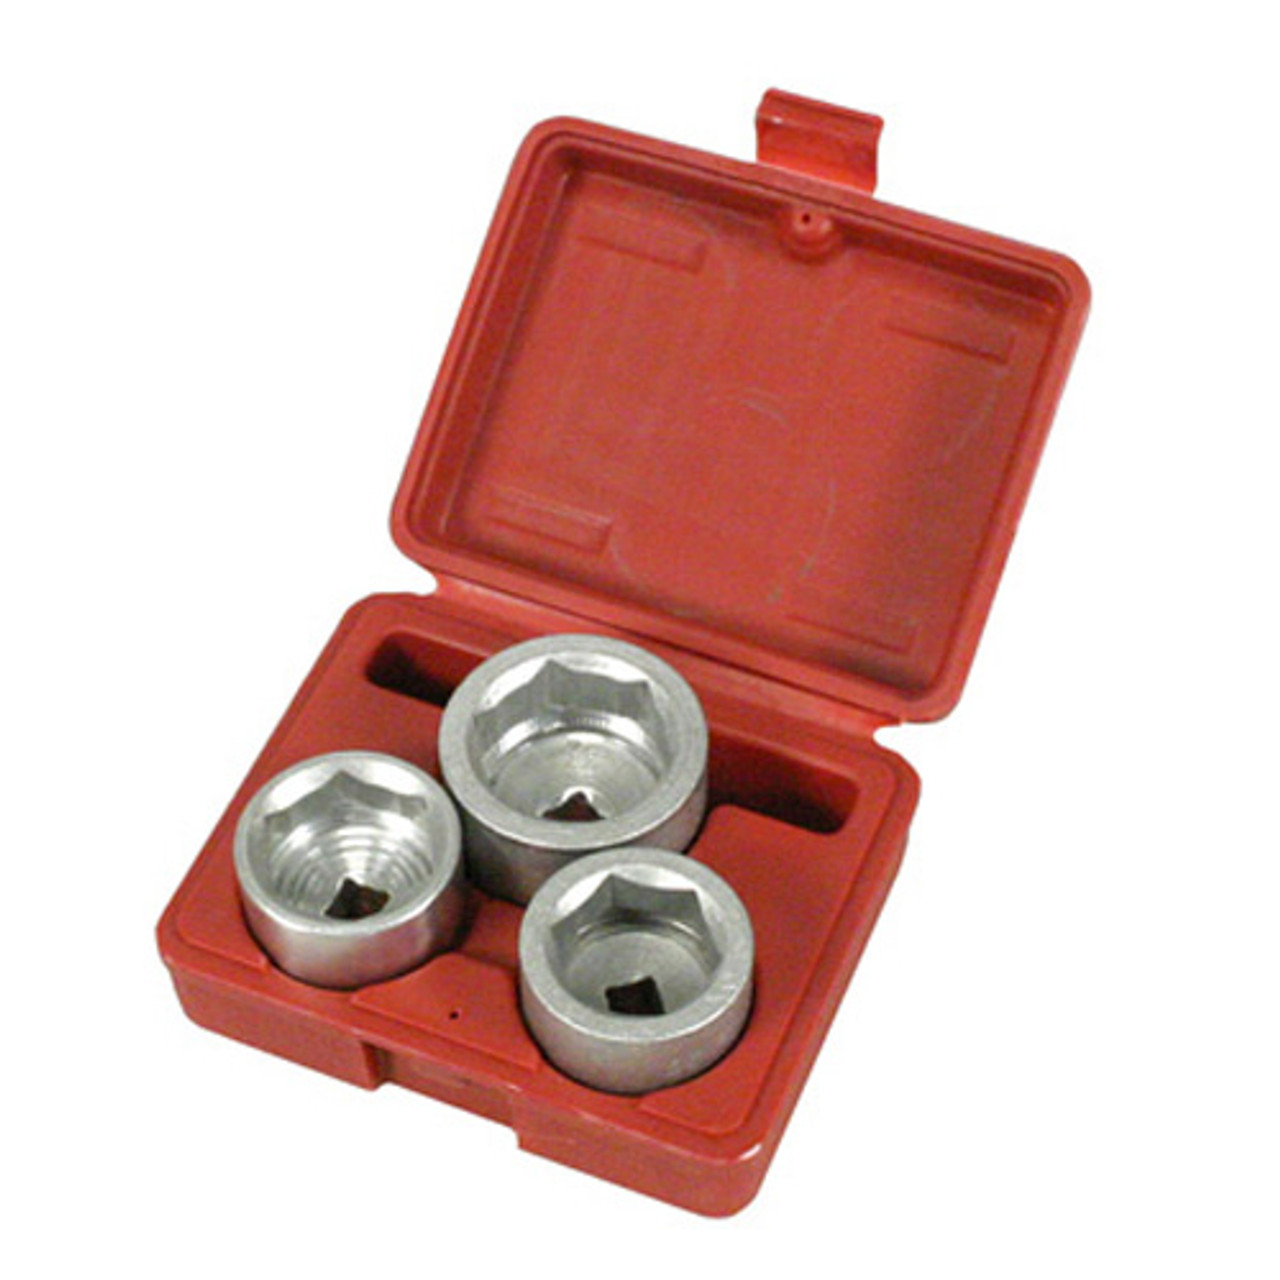 24mm Lisle 13310 Low Profile Filter Socket